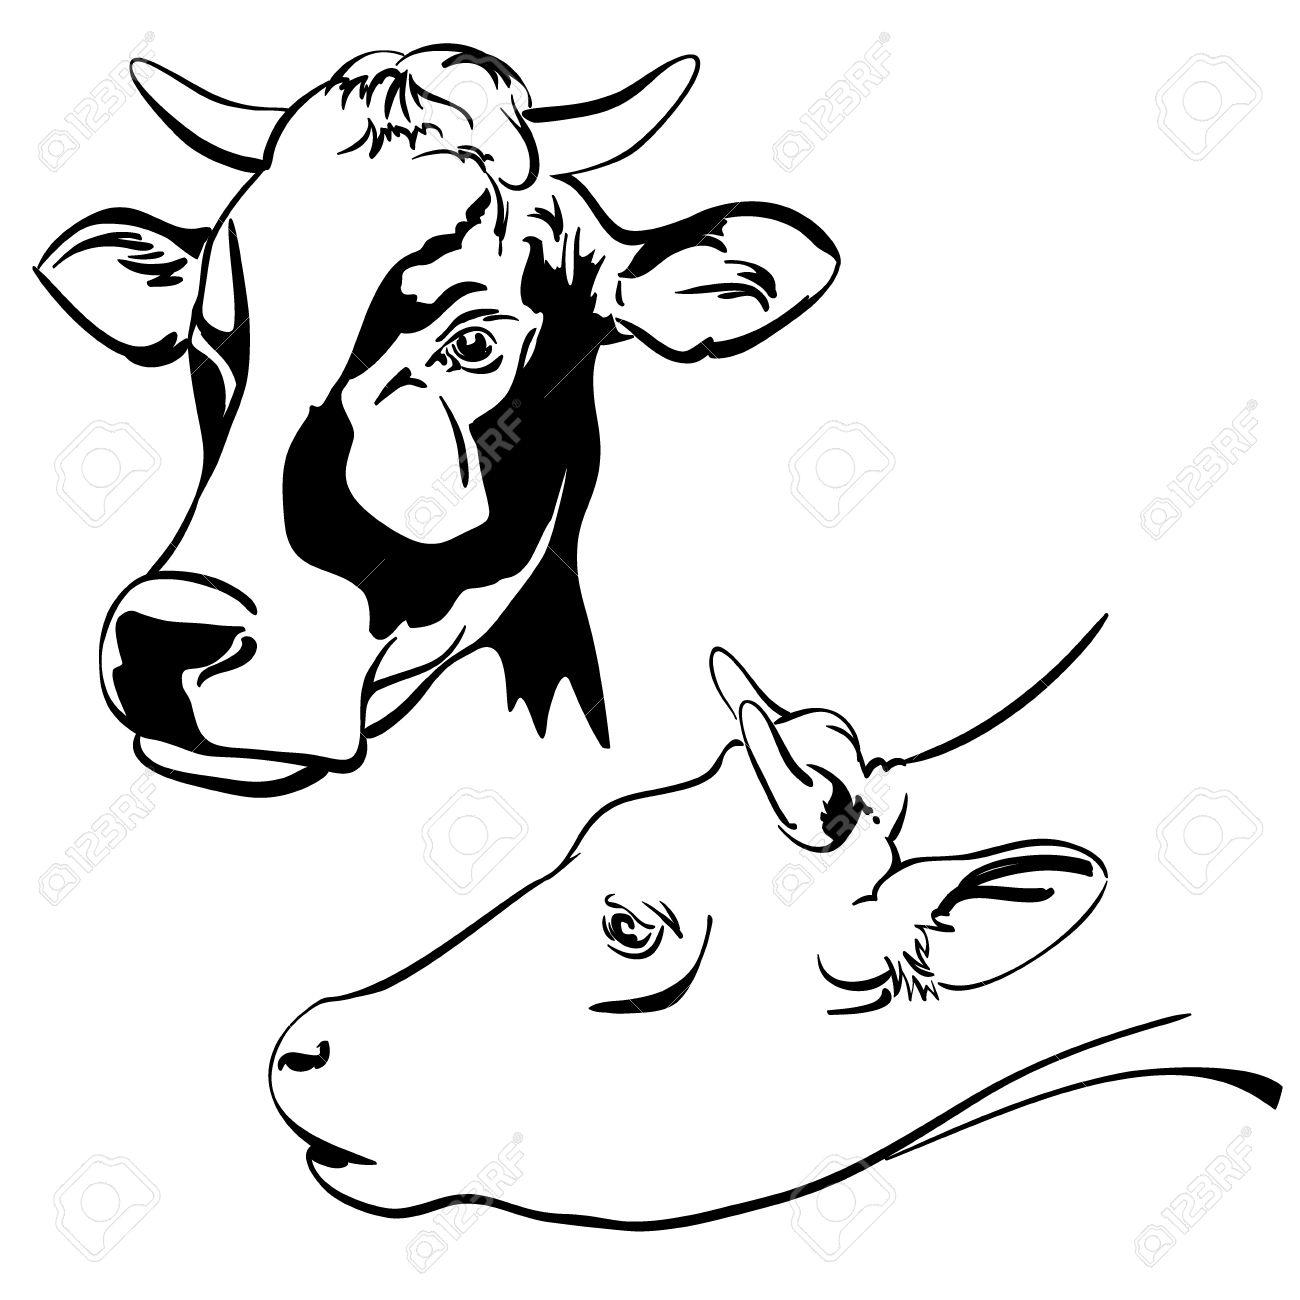 1300x1300 Drawn Cattle